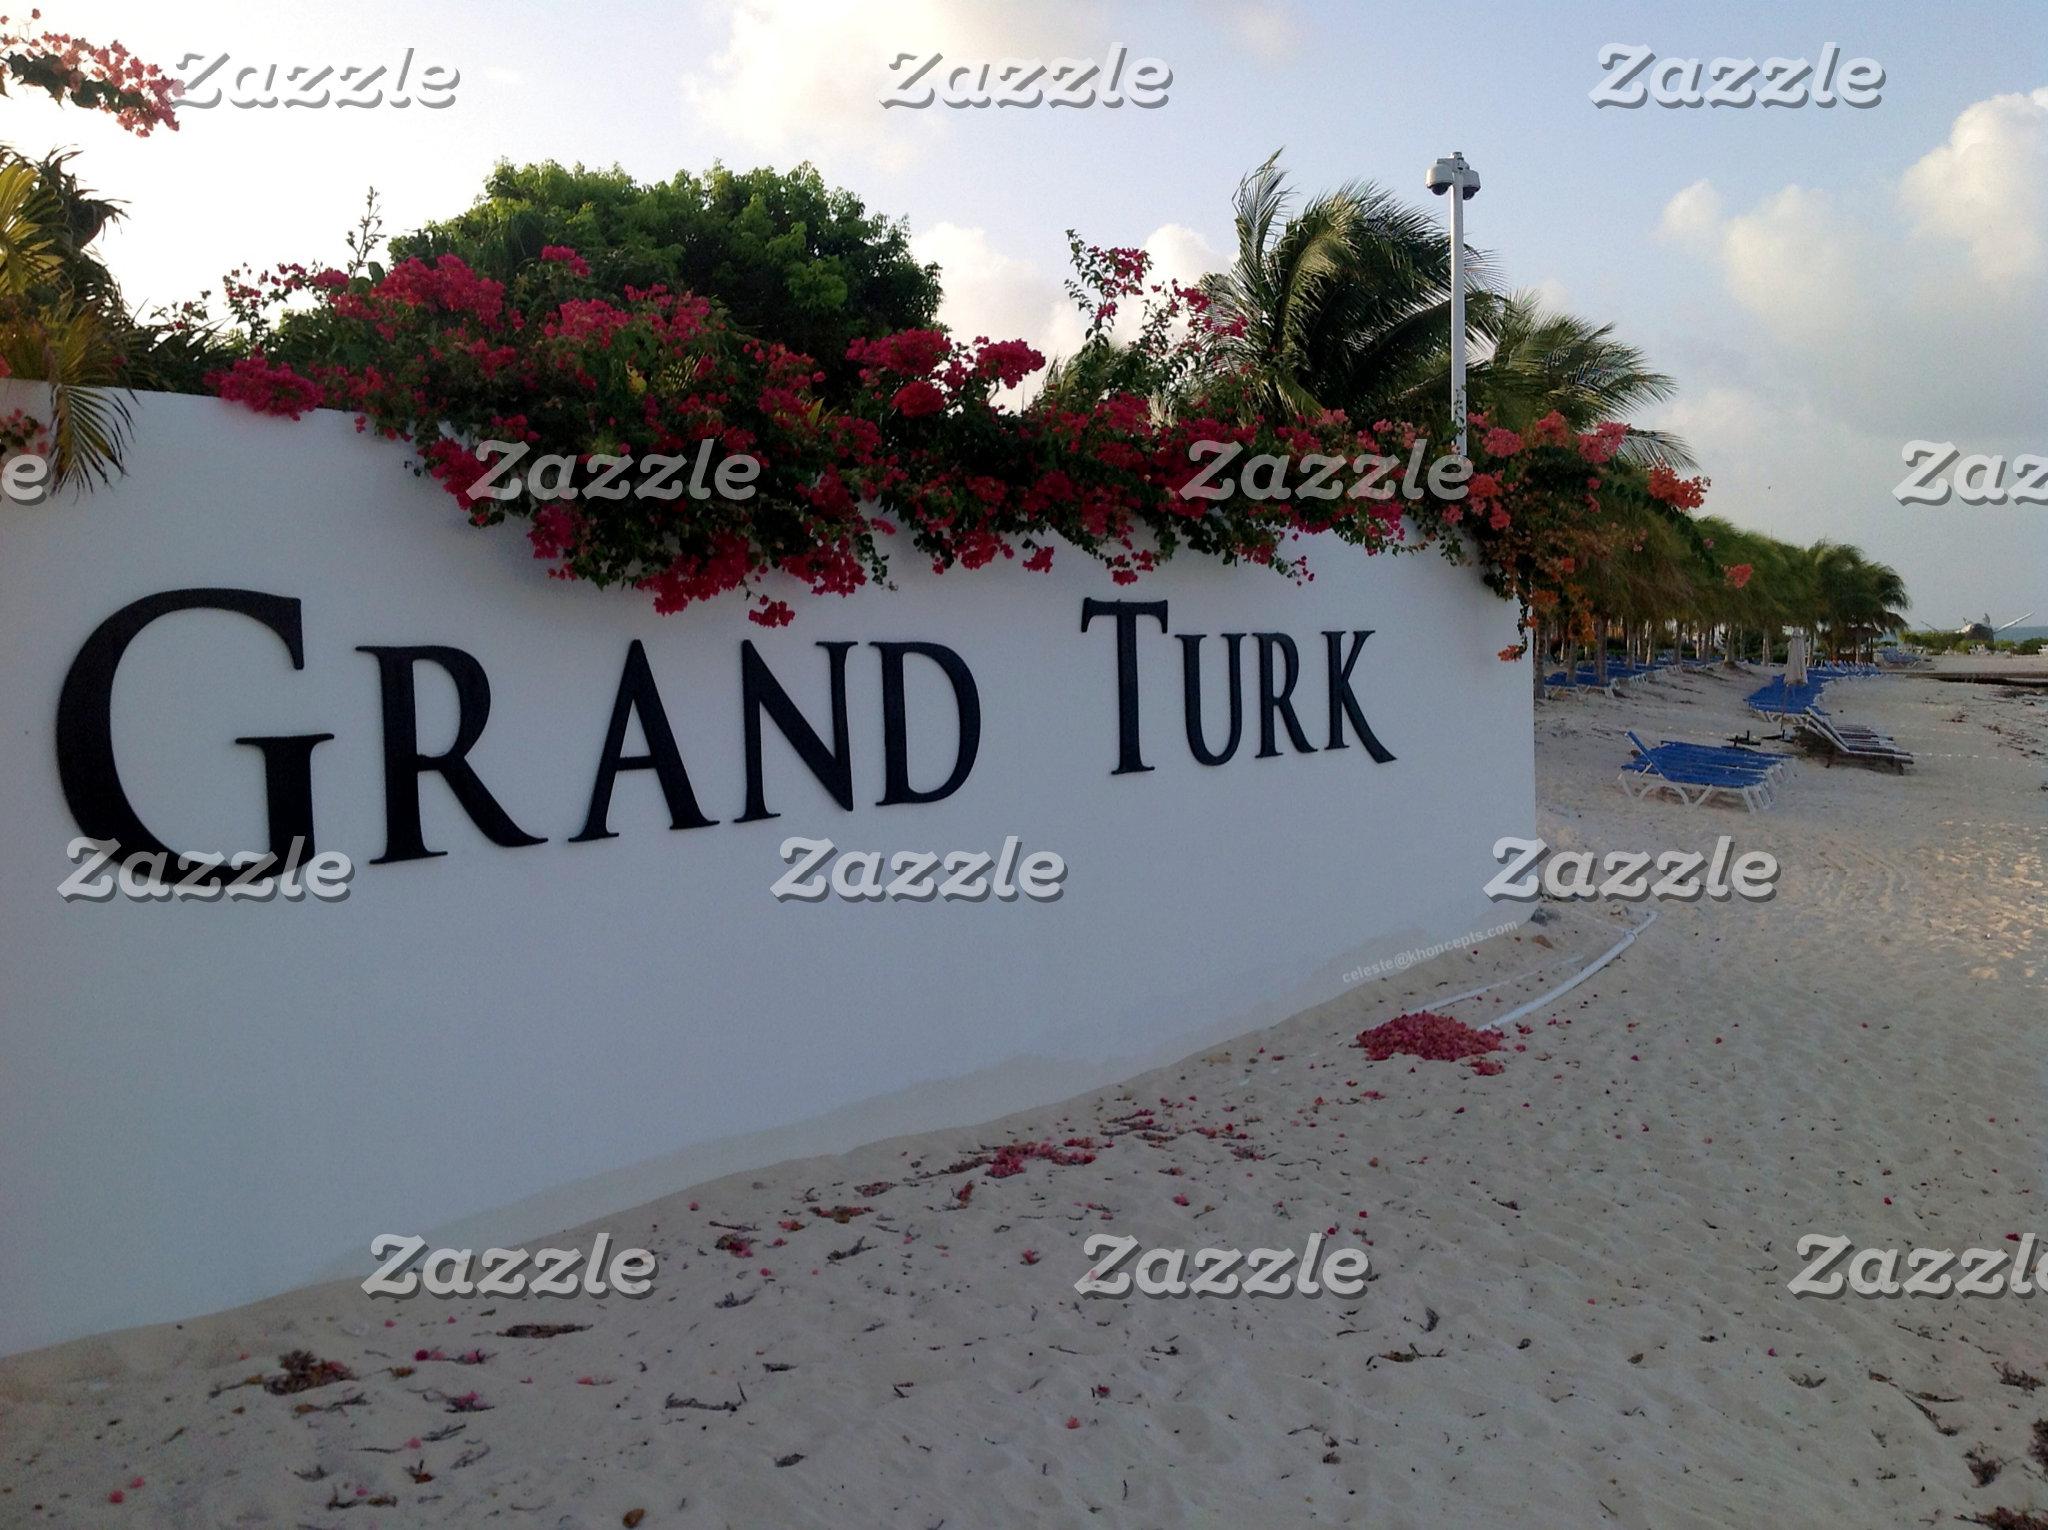 Grand Turks and Caicos